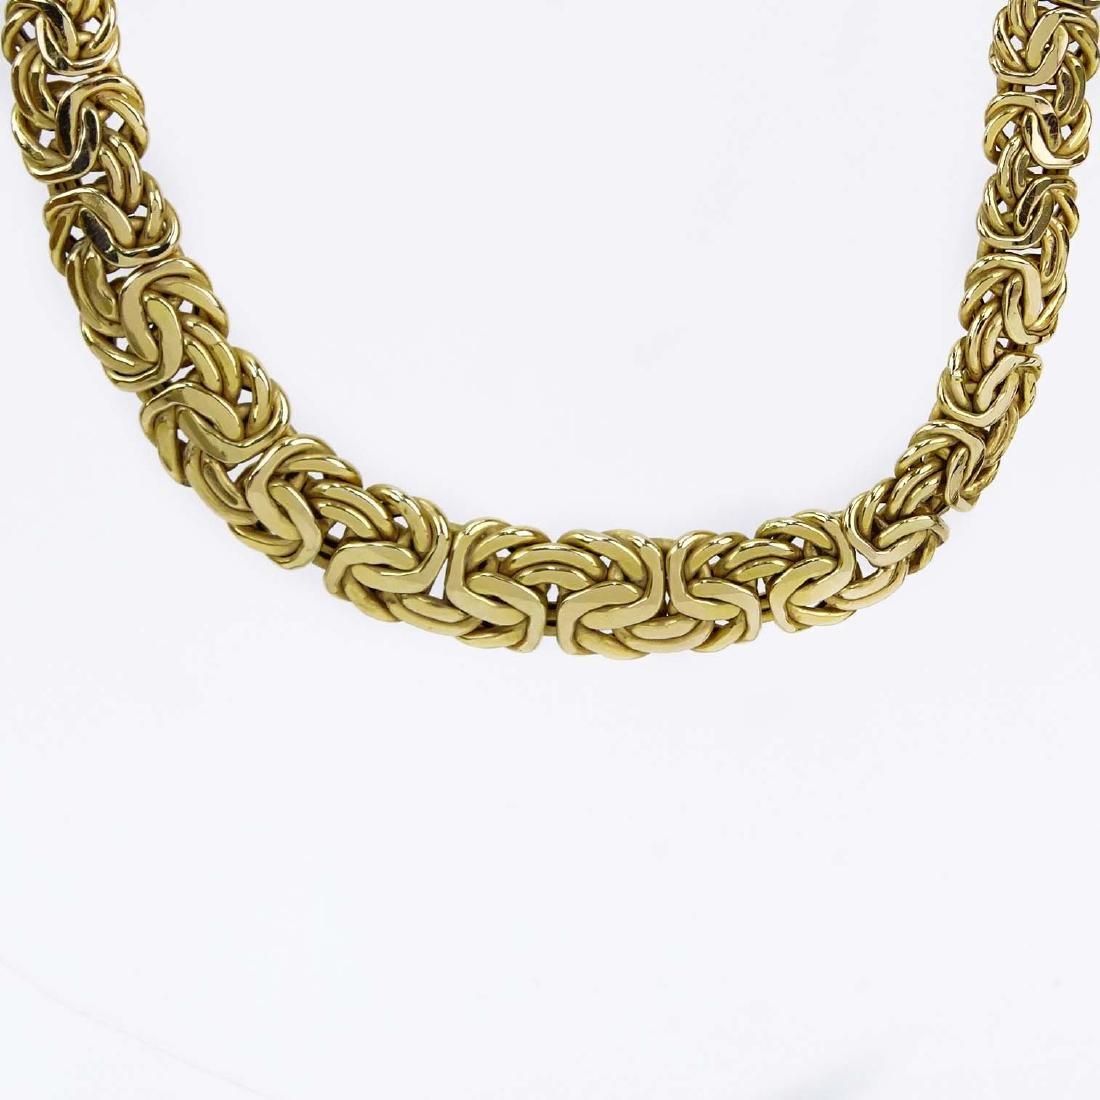 Vintage Italian 14 Karat Yellow Gold Link Necklace.